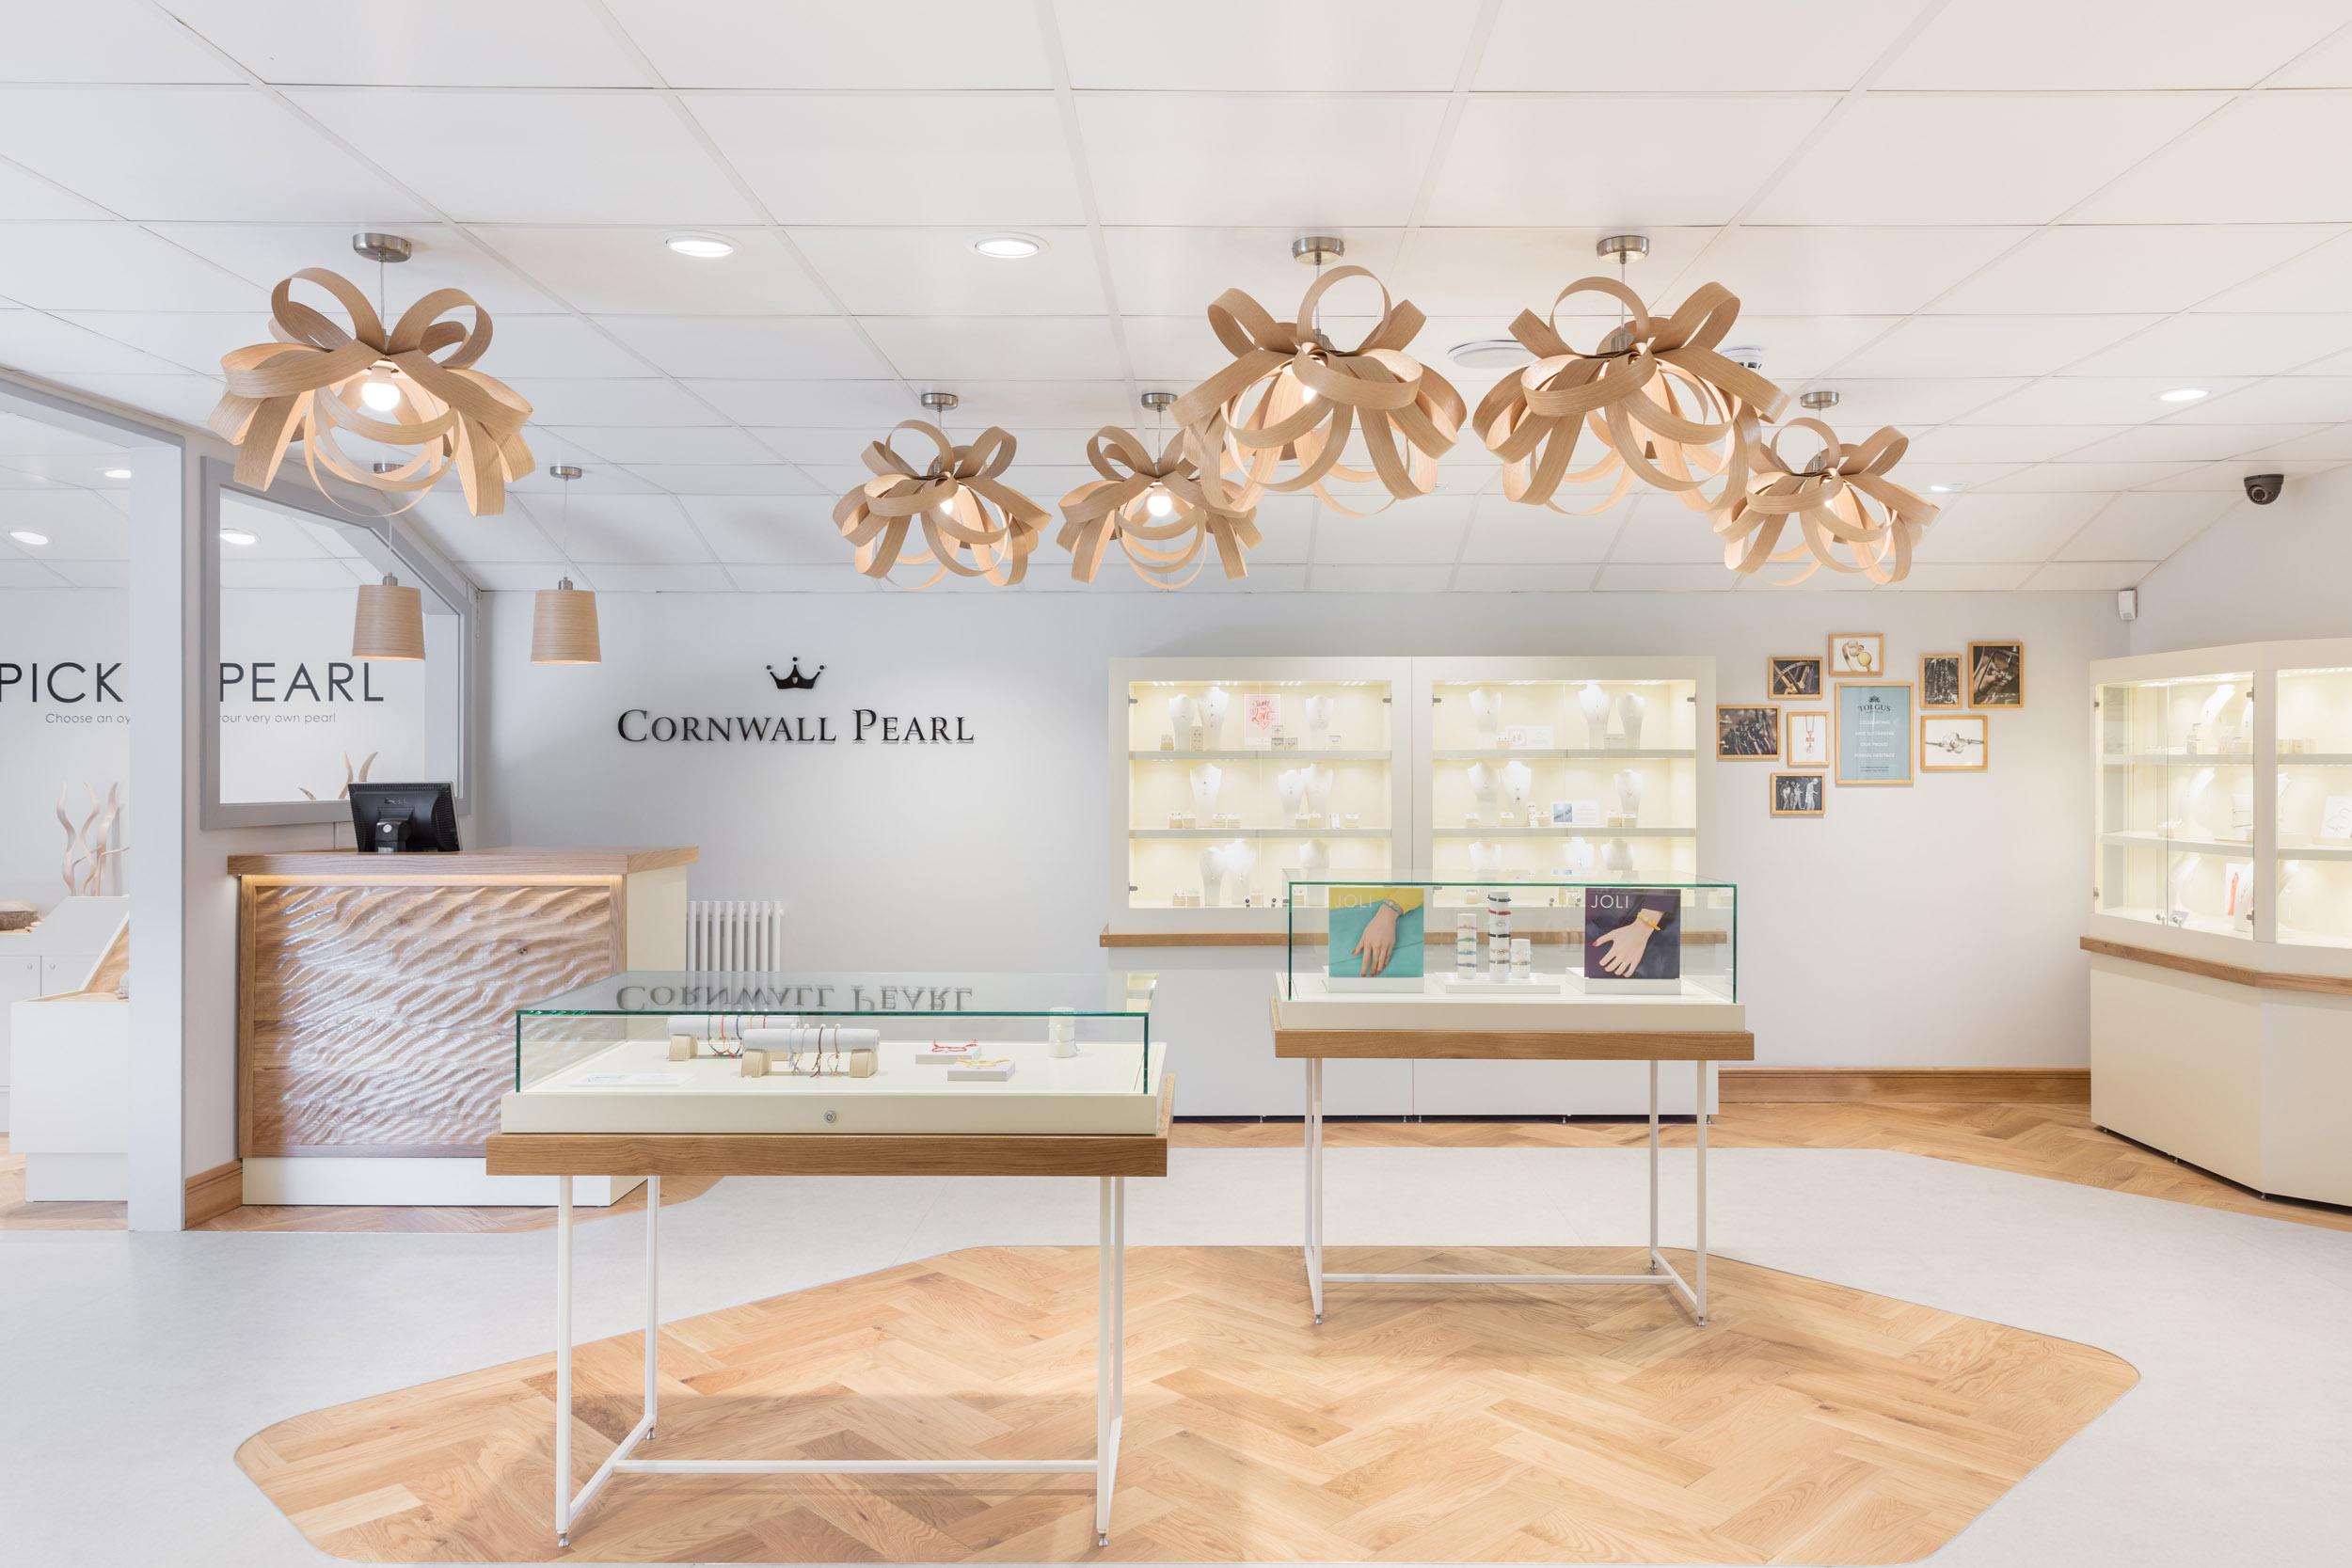 Herringbone wood flooring installation for Cornwall Pearl's retail space